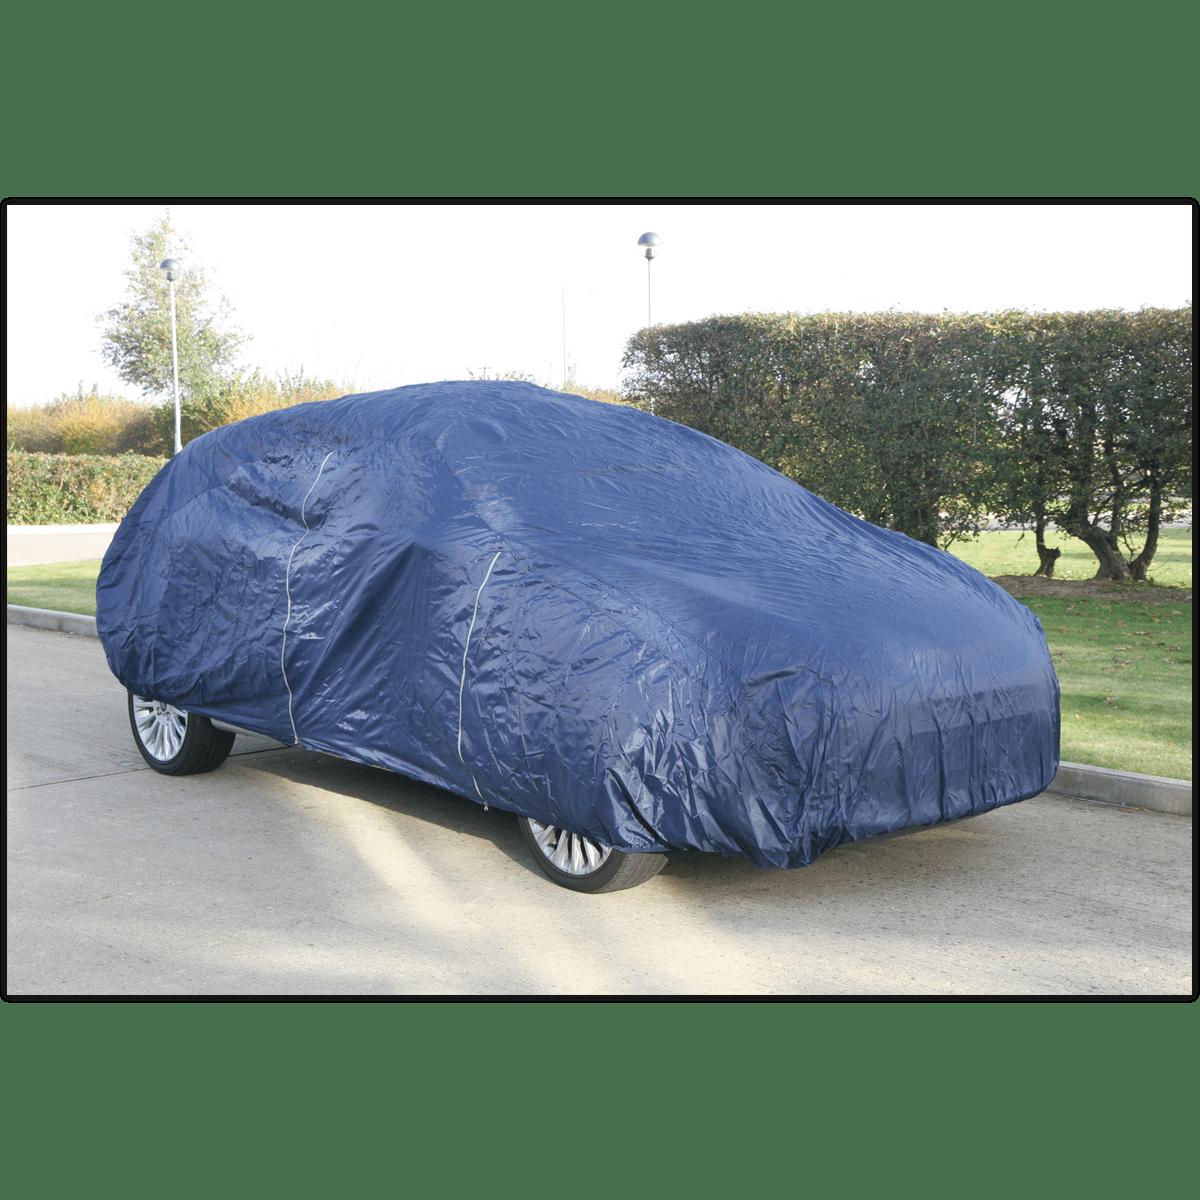 Sealey Car Cover Lightweight Medium 4060 x 1650 x 1220mm CCEM